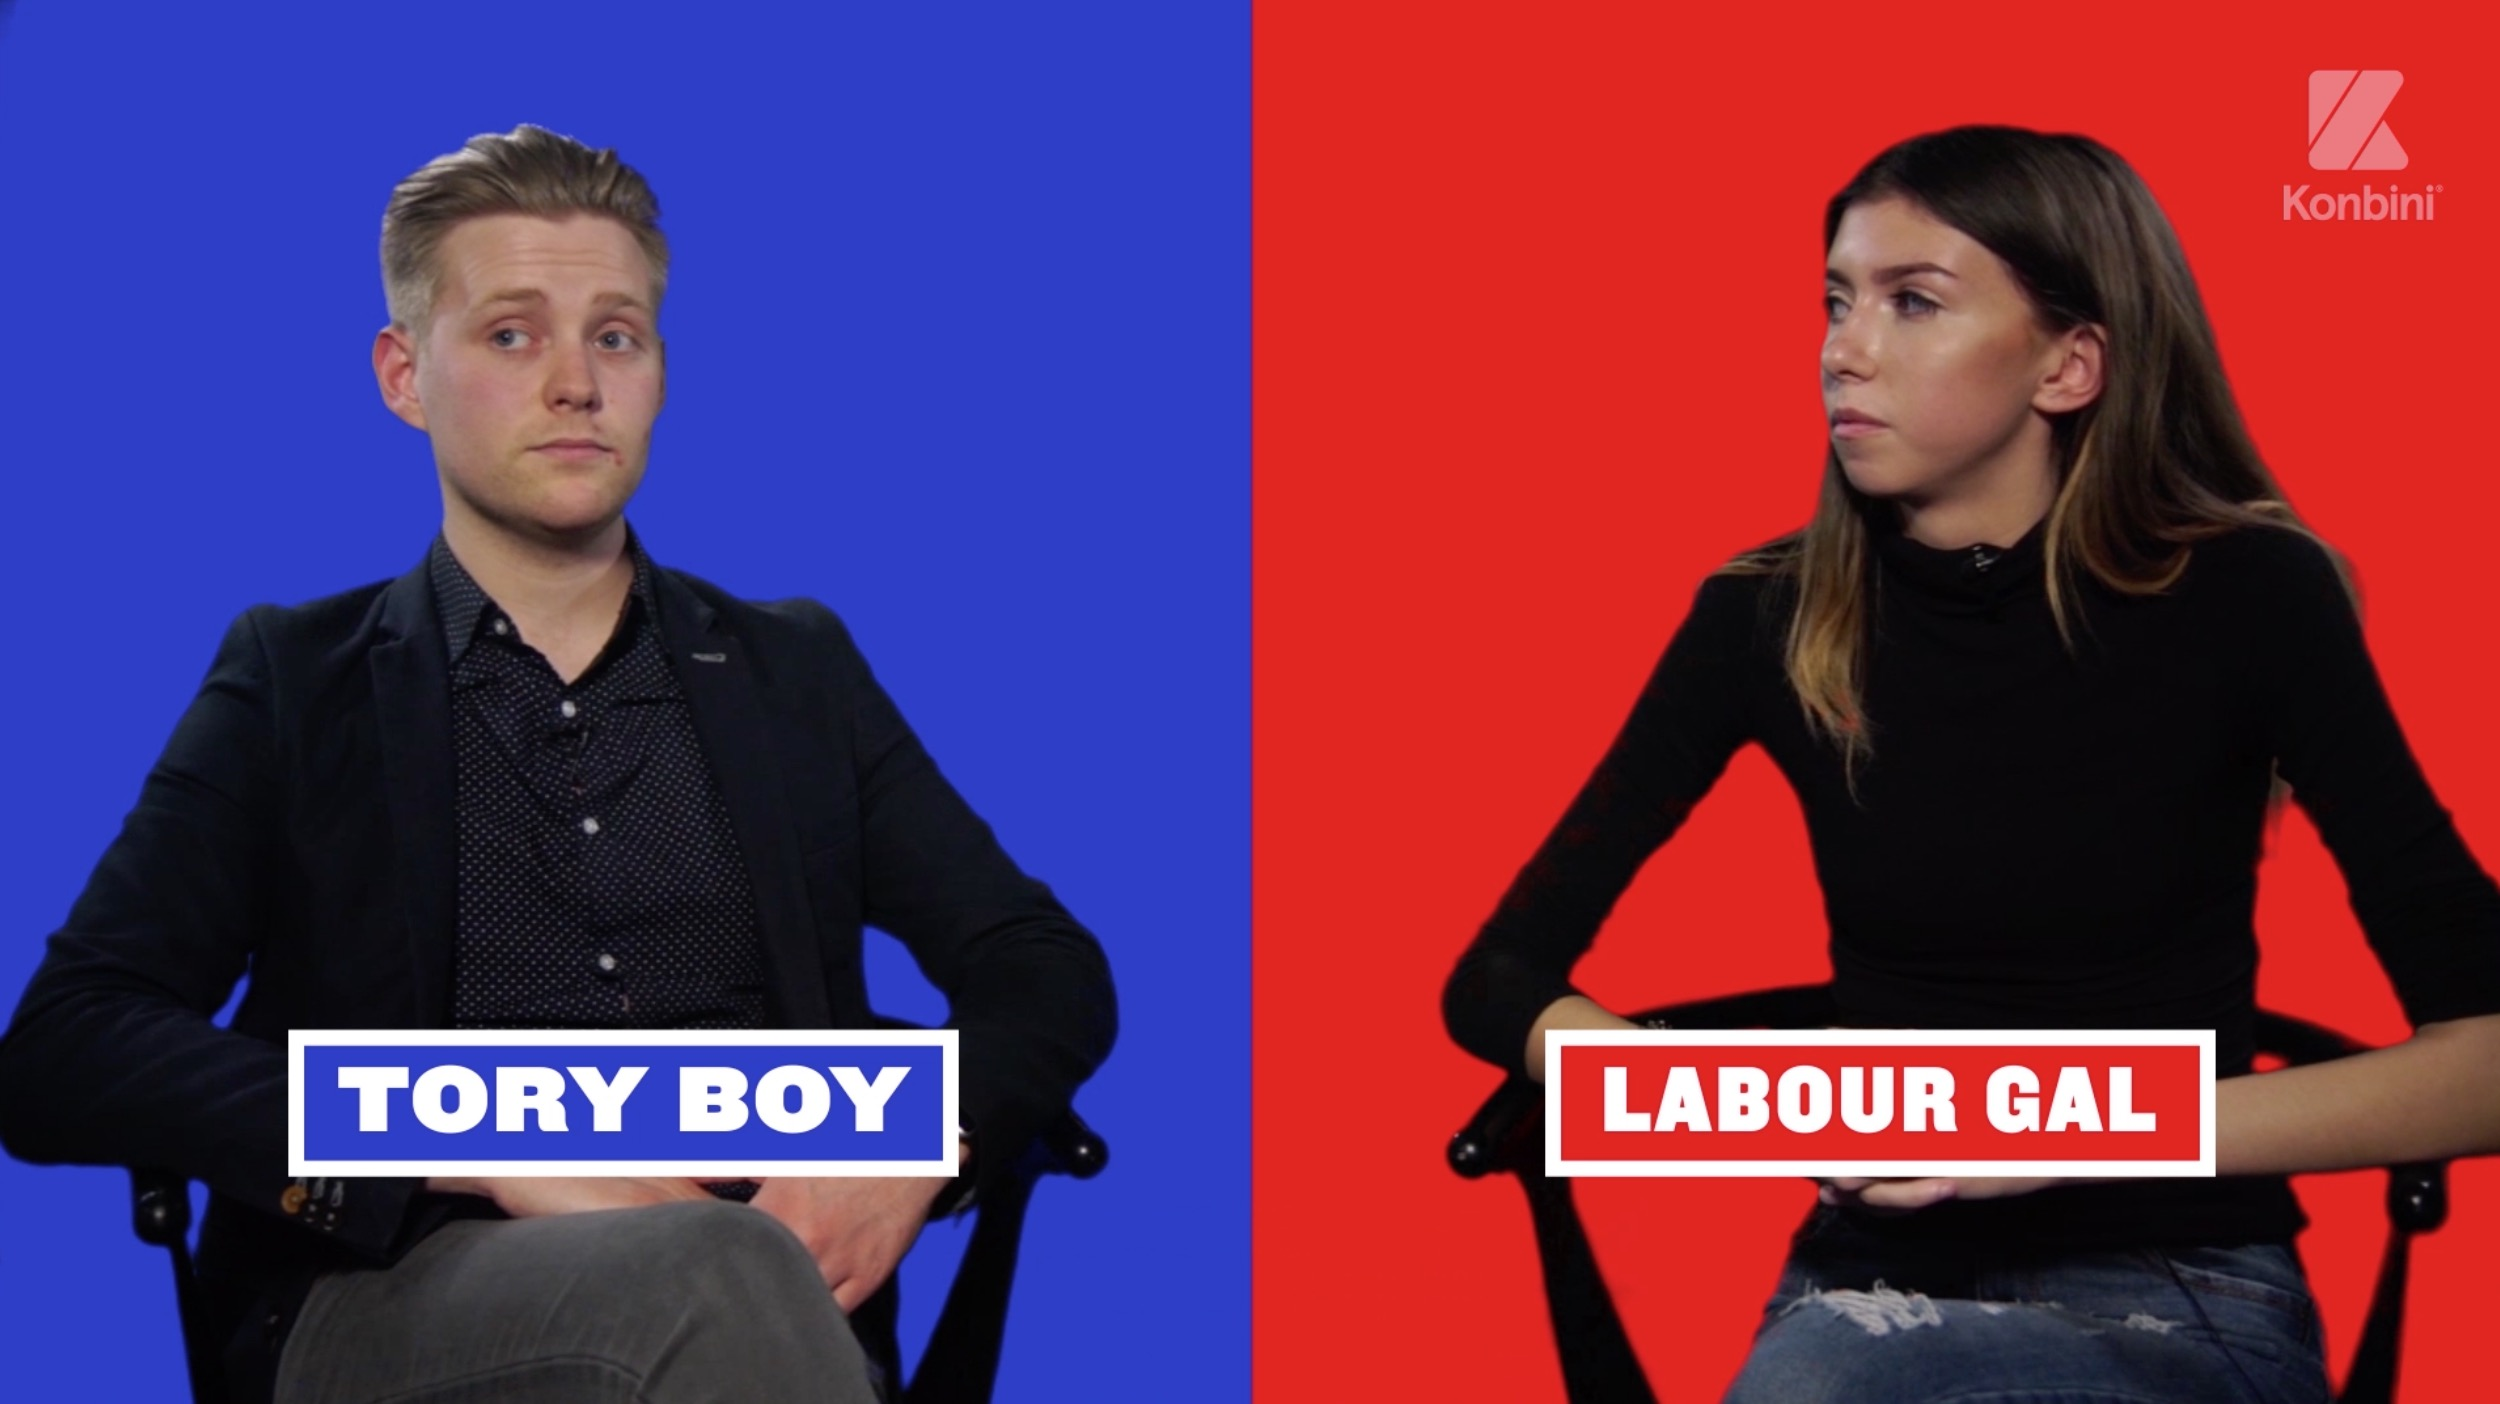 Tory Labour video series Konbini UK